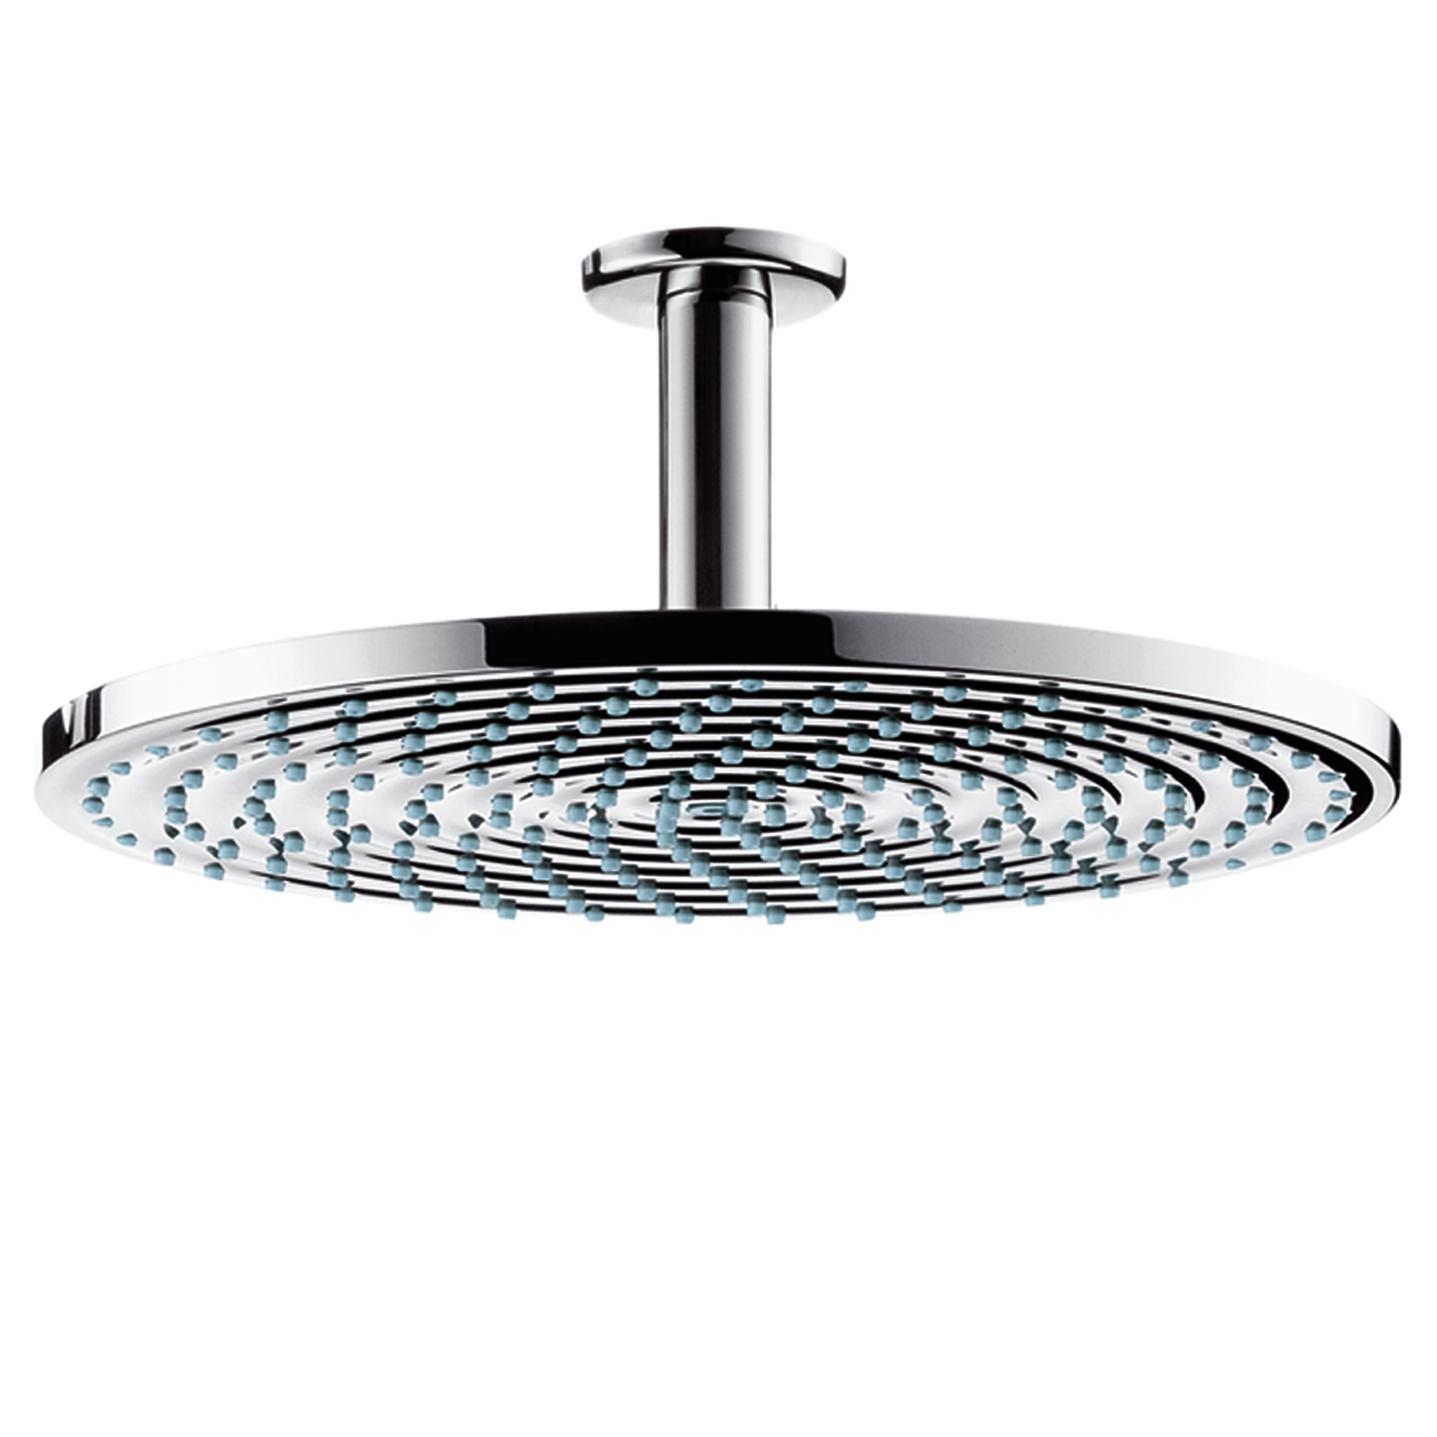 Details About Hansgrohe Dish Shower Head Raindance Air 27494000